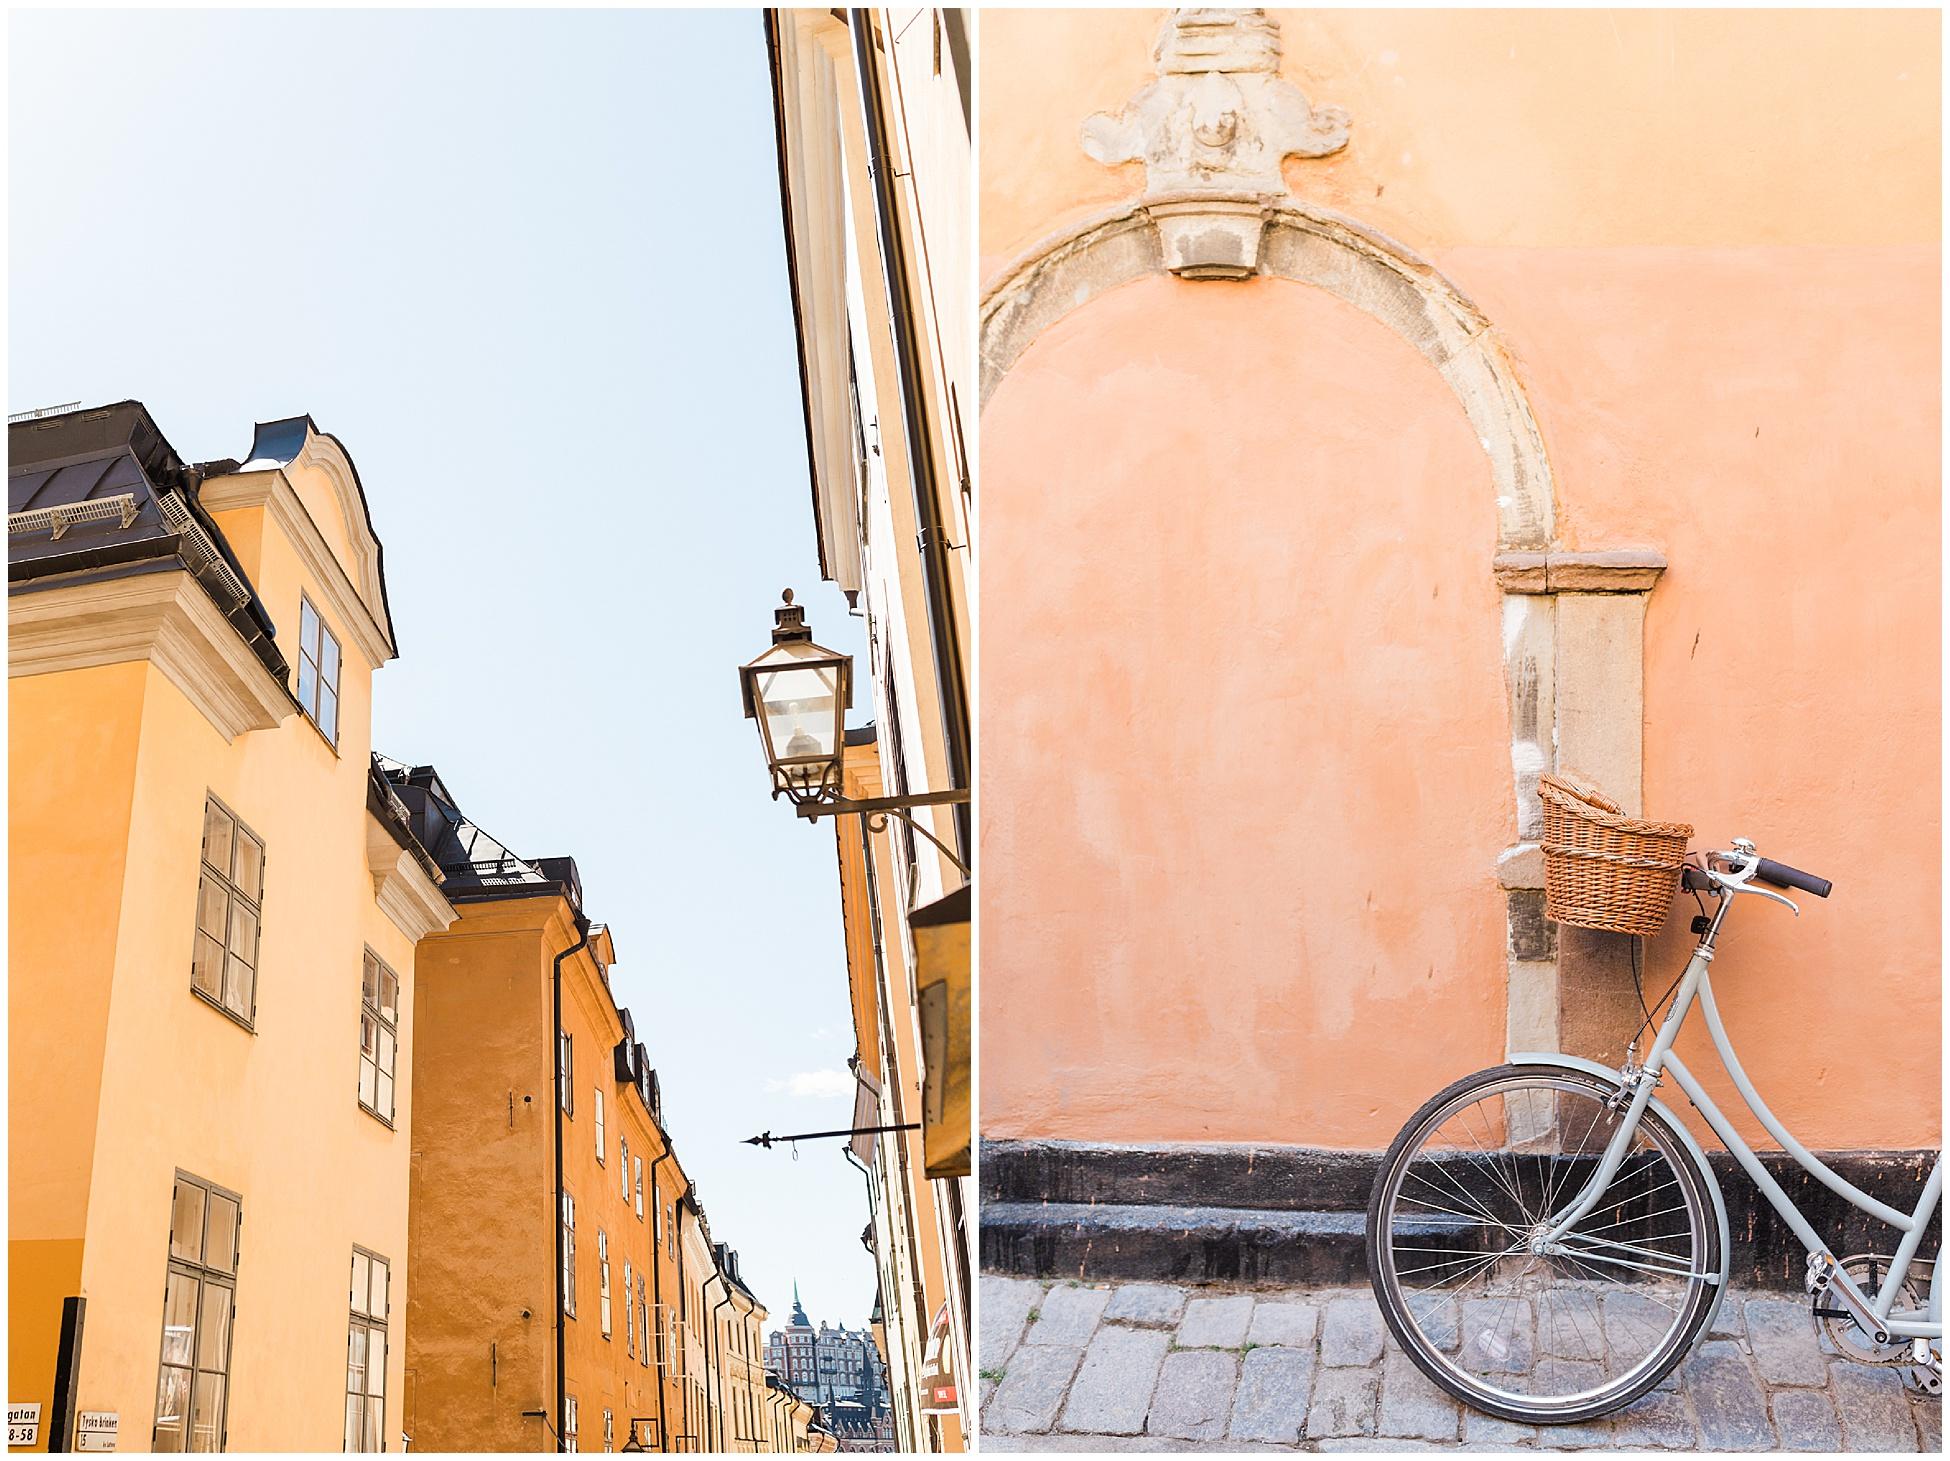 stockholm-010.jpg